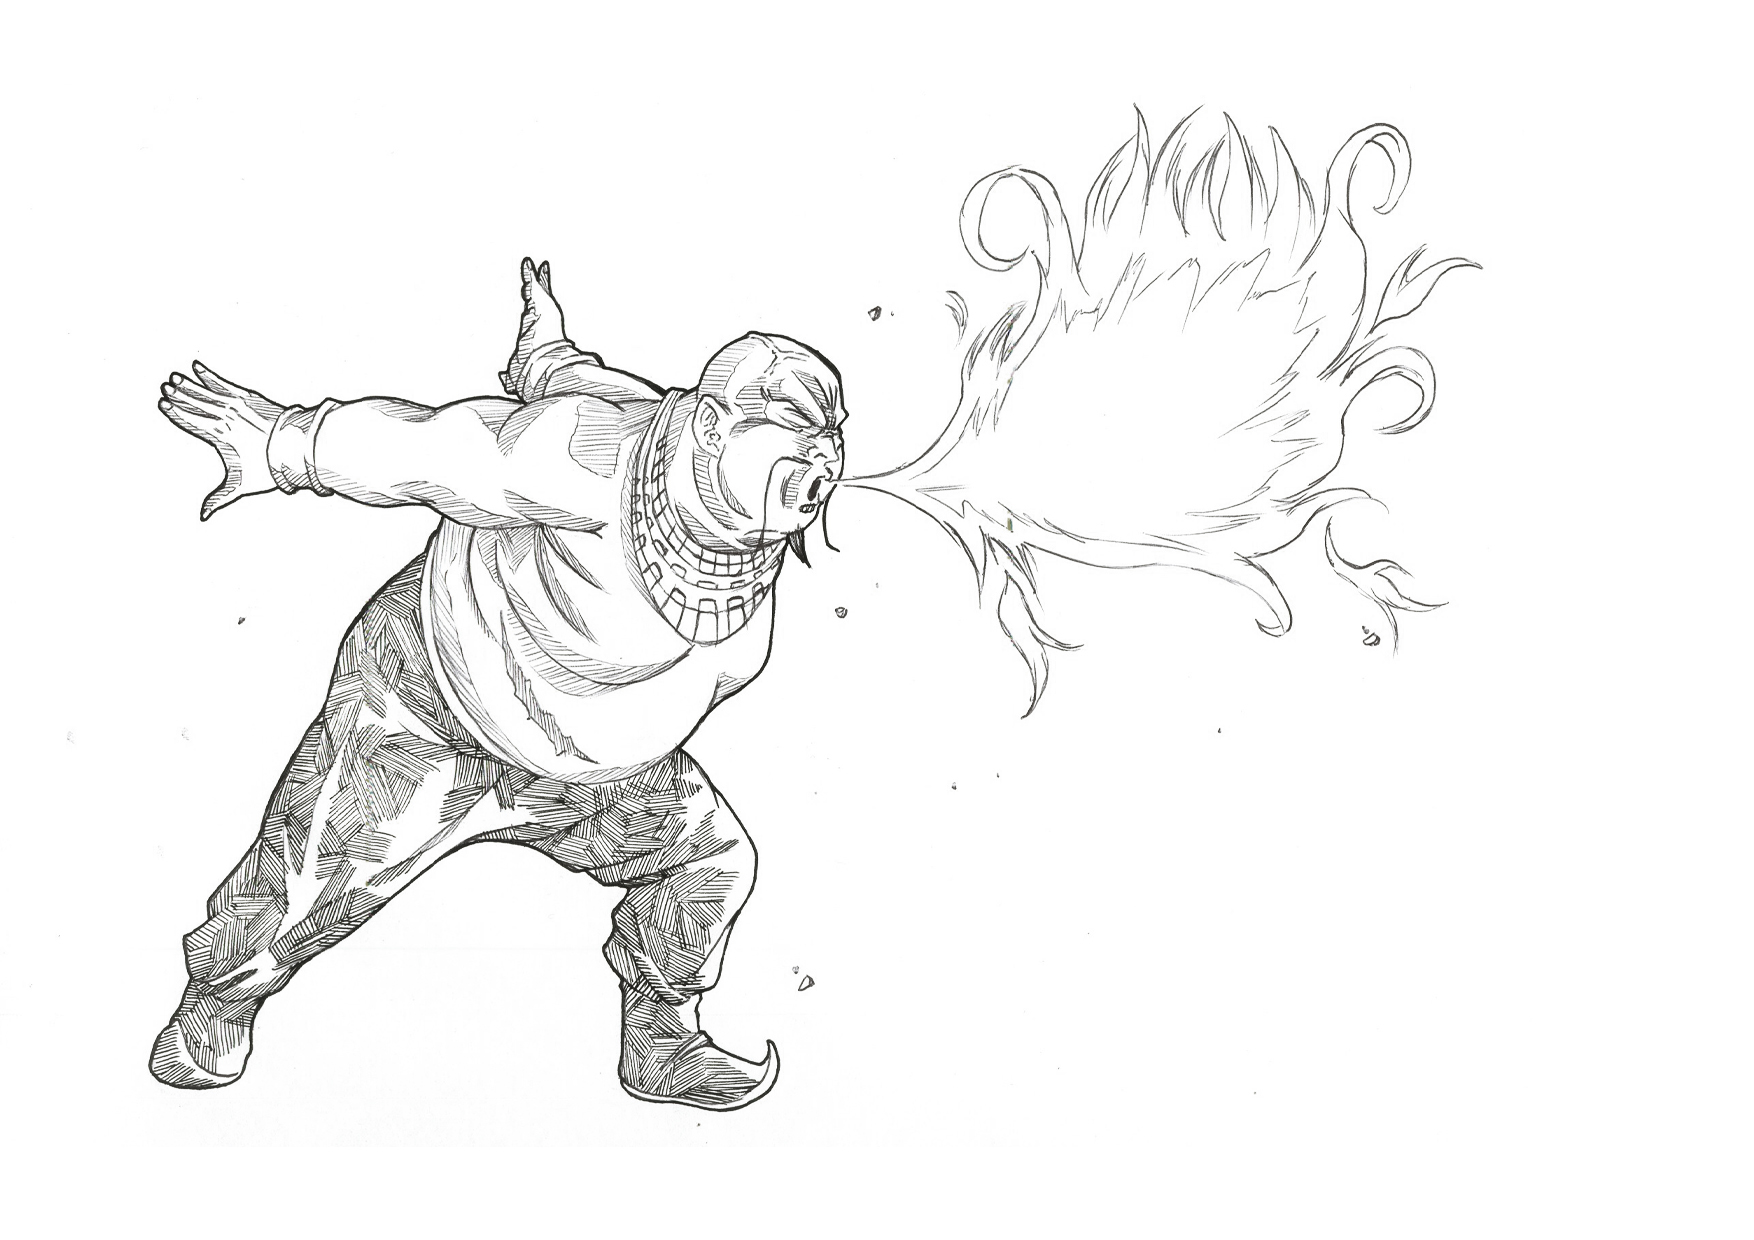 Karnov Breathing Fire By Bloodsplach Karnov Breathing Fire By Bloodsplach  How To Draw A Fire Breathing